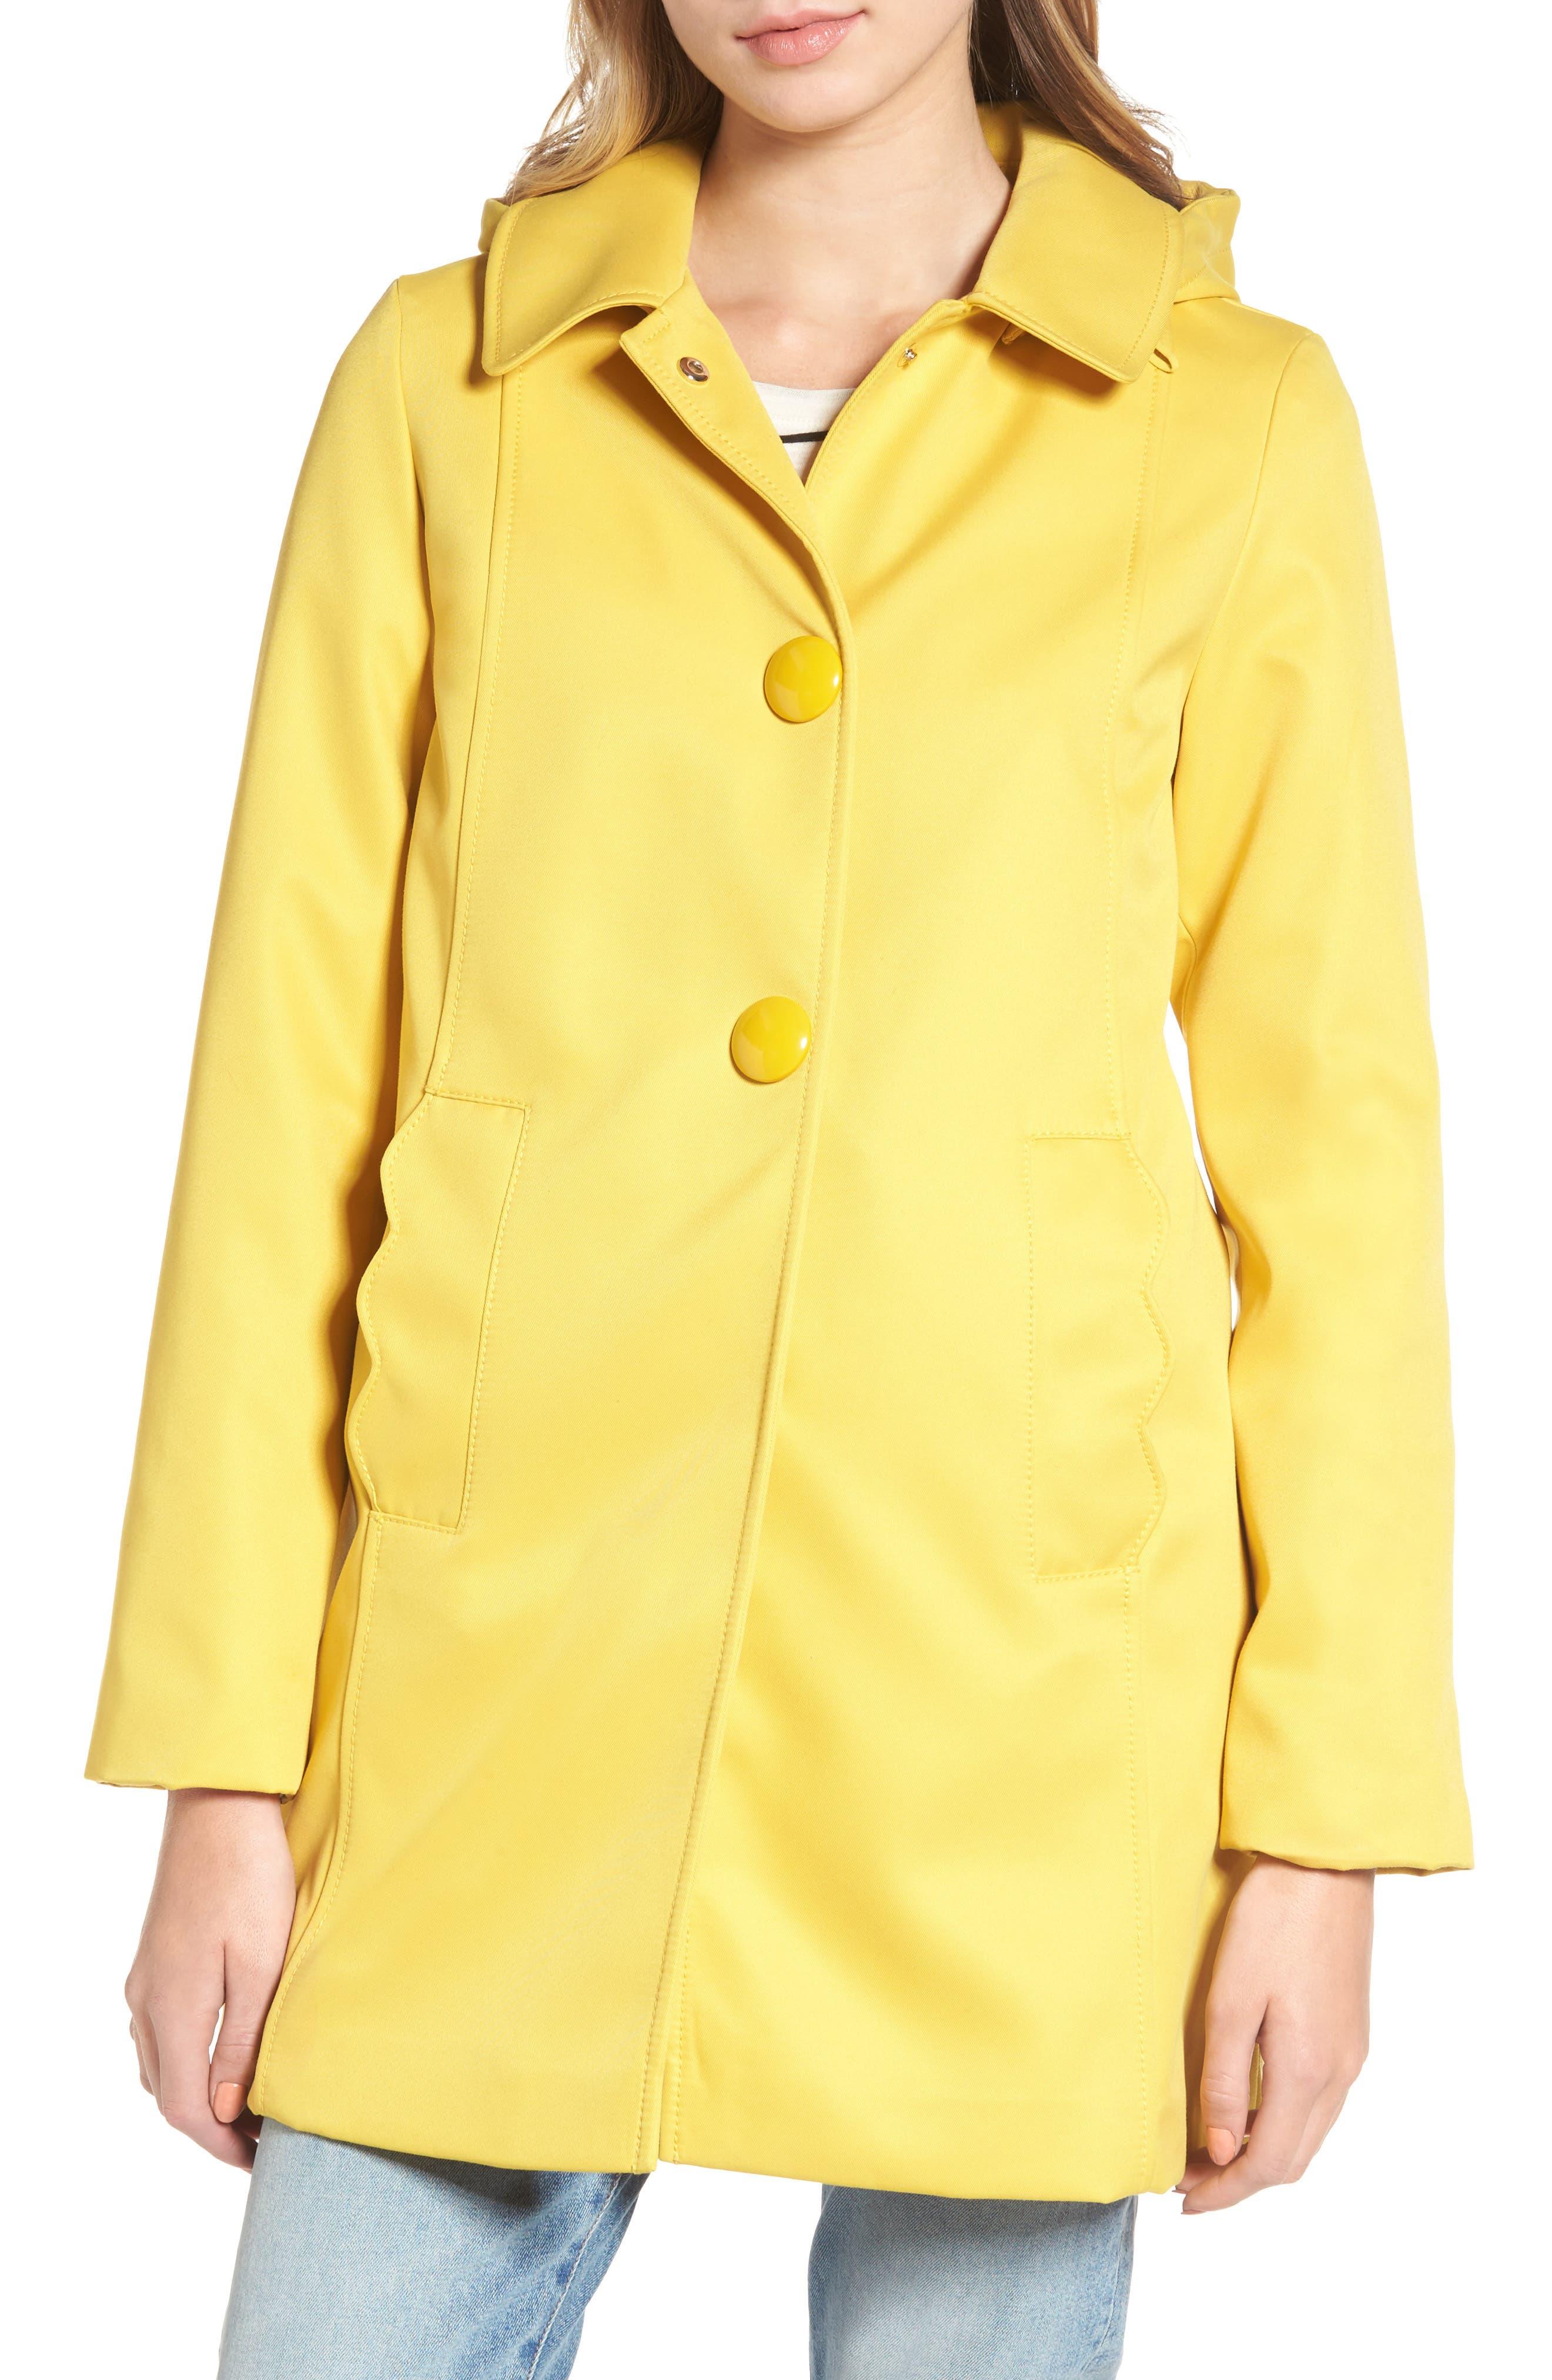 Main Image - kate spade new york scallop edge raincoat